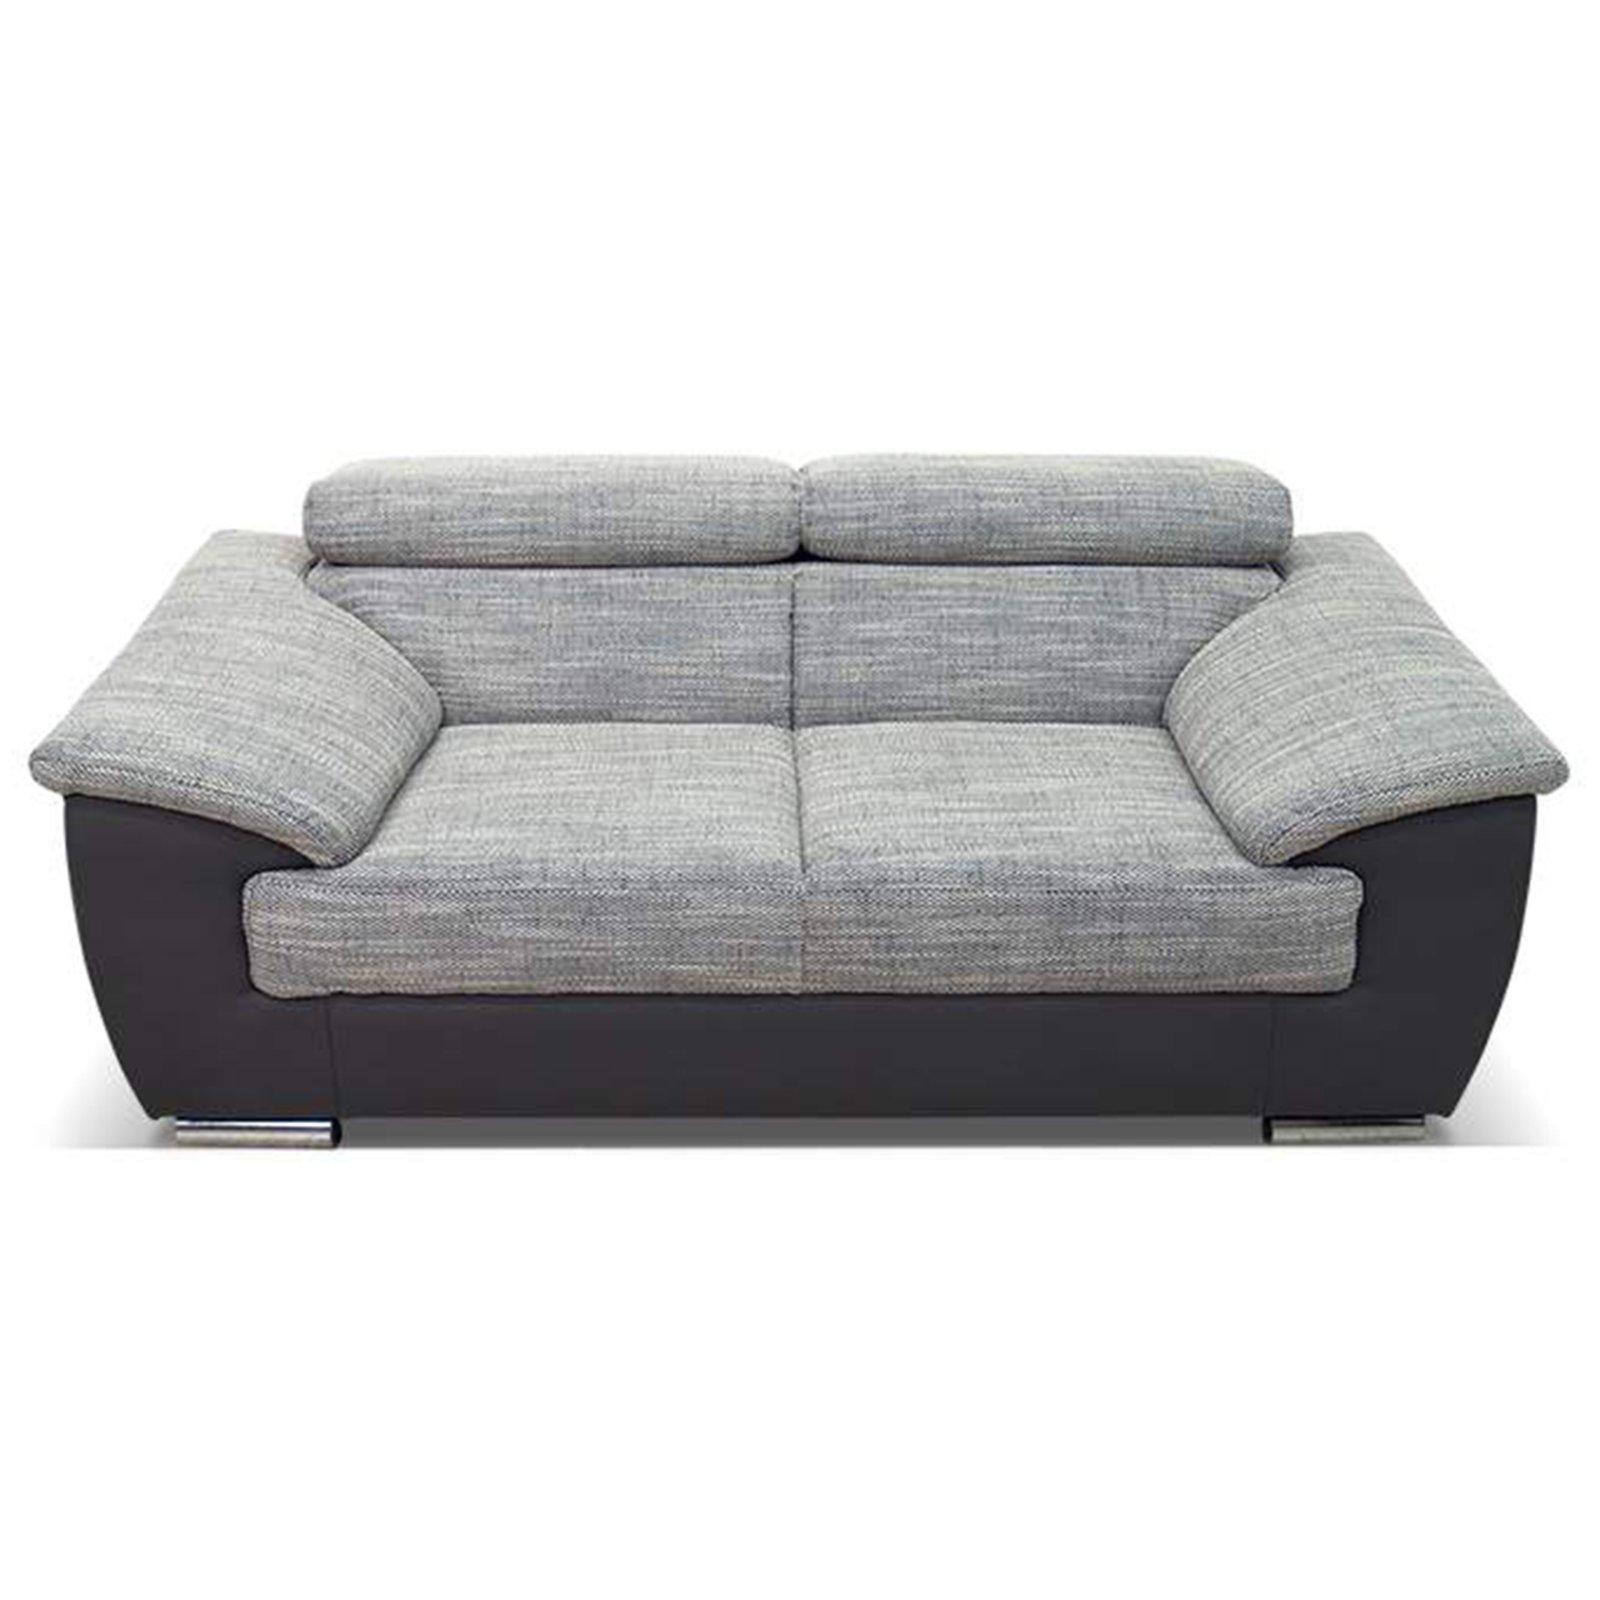 2 sitzer sofa grau dunkelgrau kopfteilverstellung einzelsofas 2er 3er 4er sofas. Black Bedroom Furniture Sets. Home Design Ideas